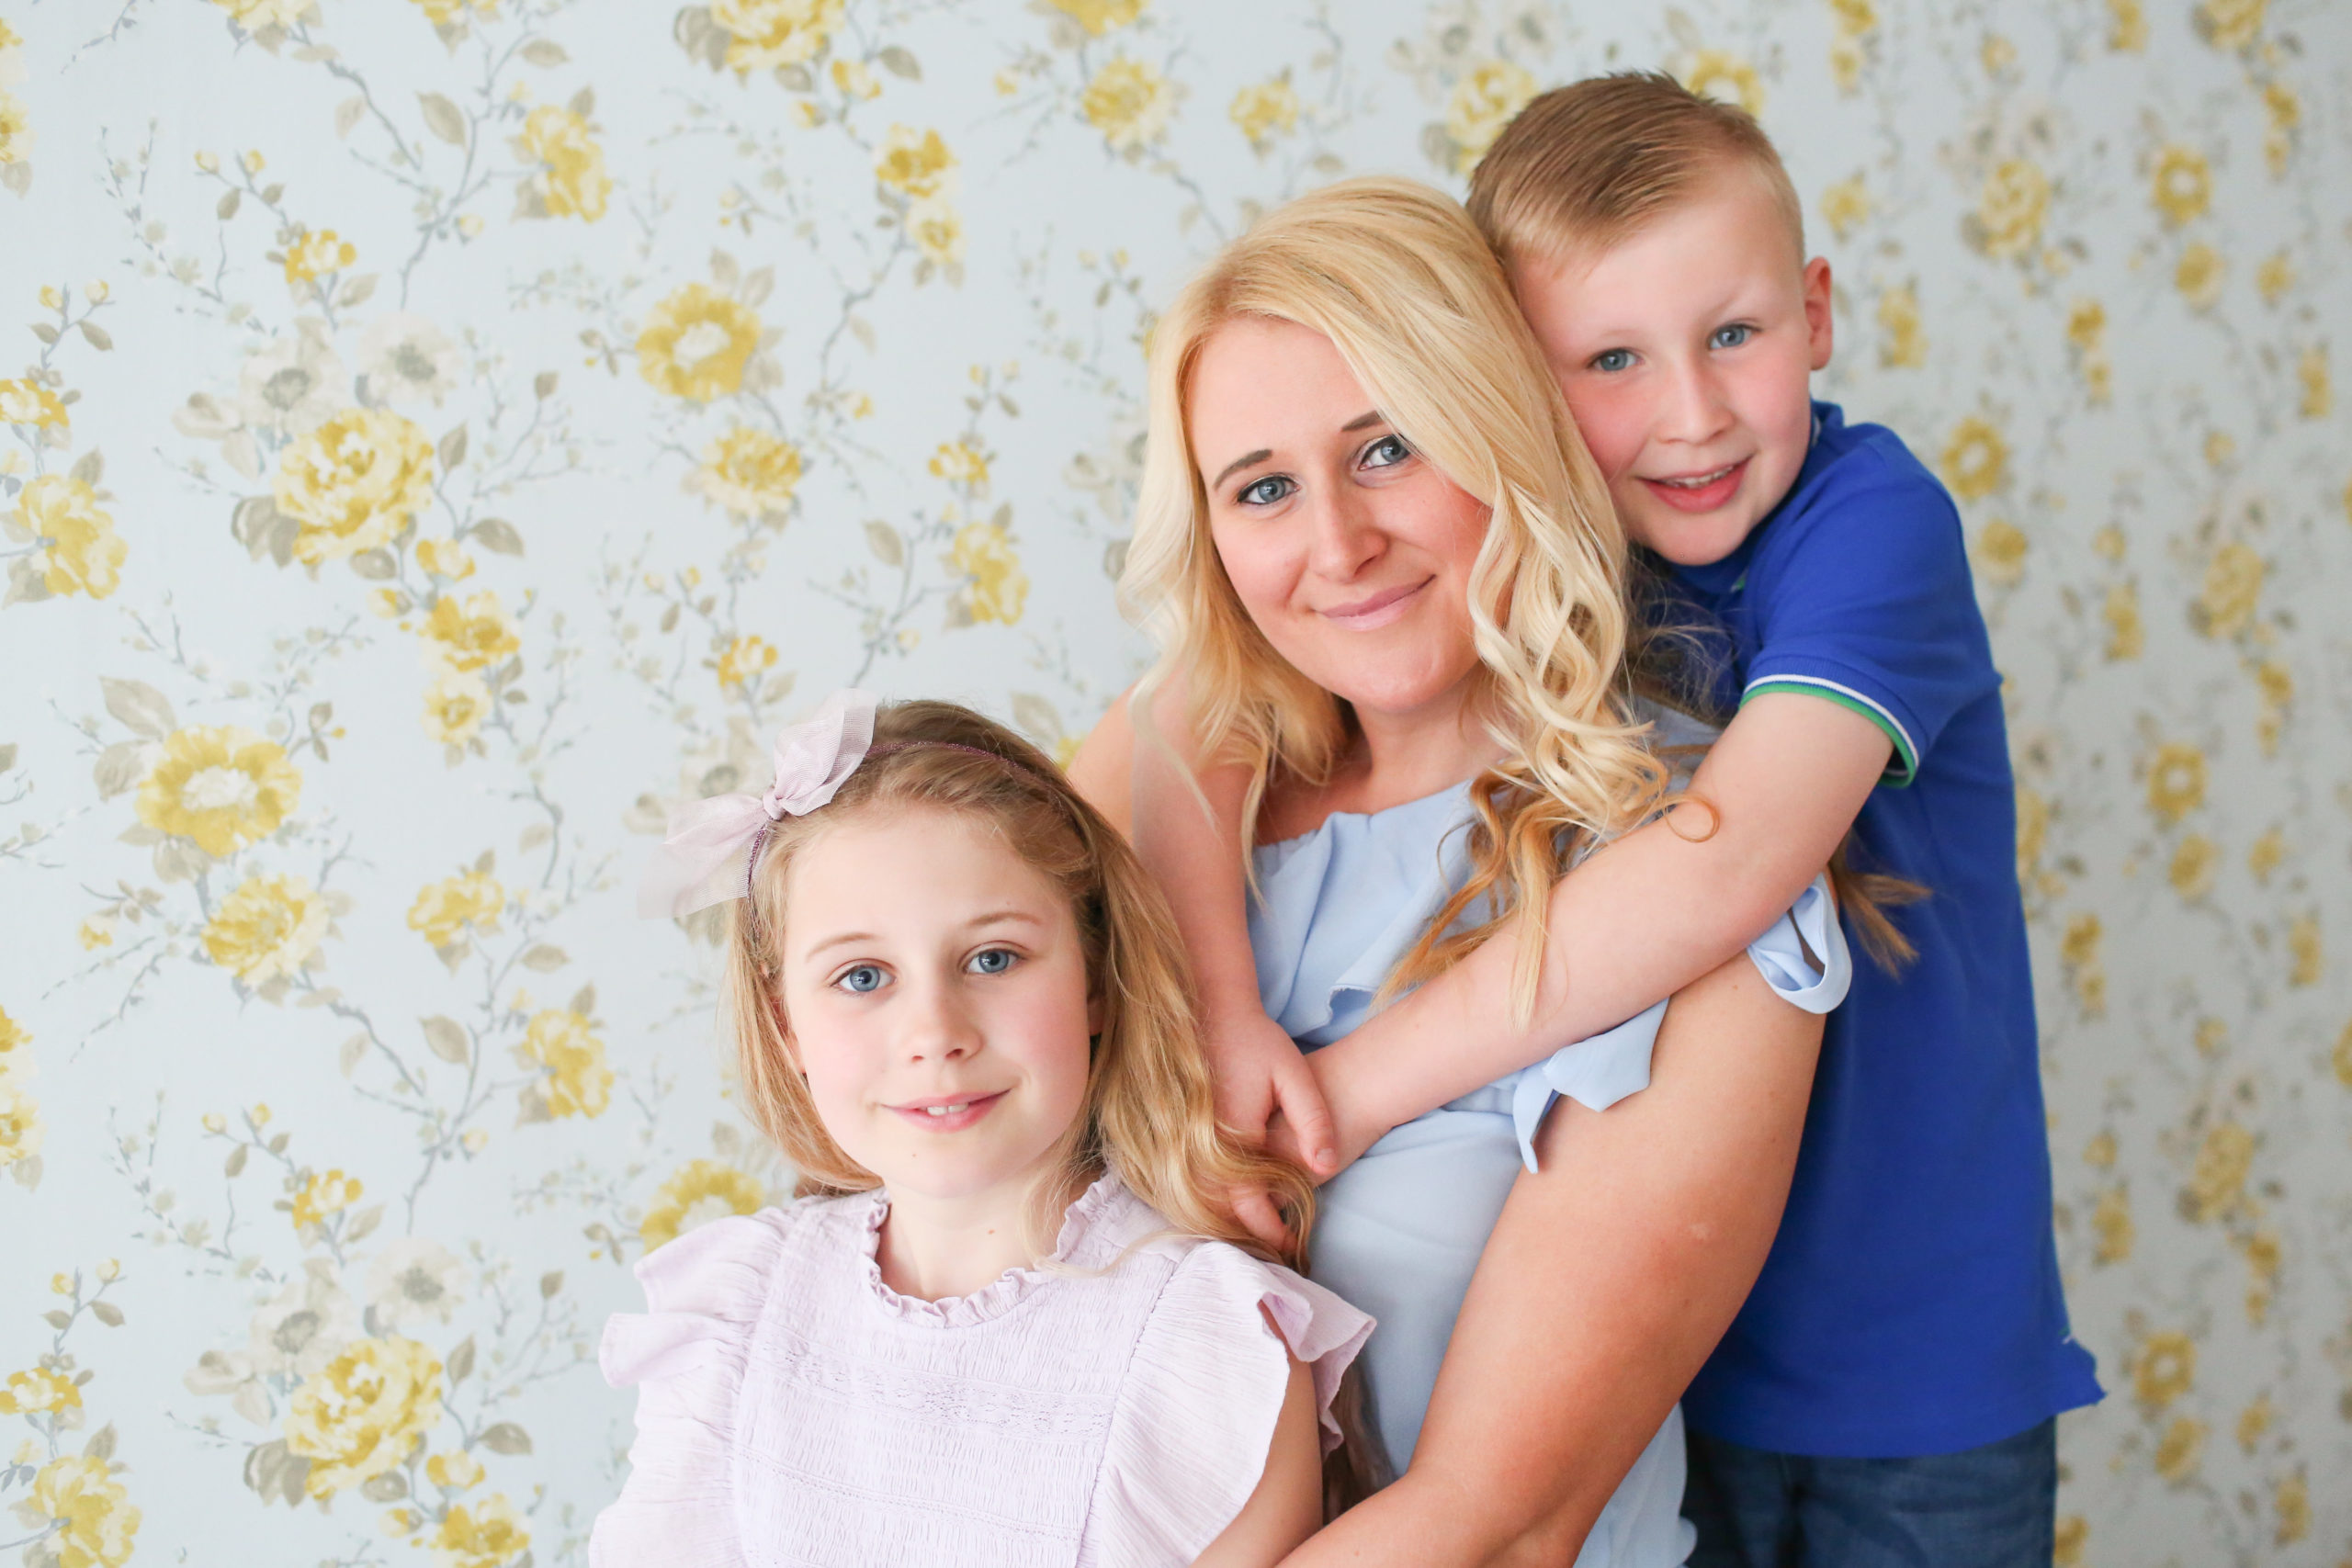 family portrait photographers Manchester creative